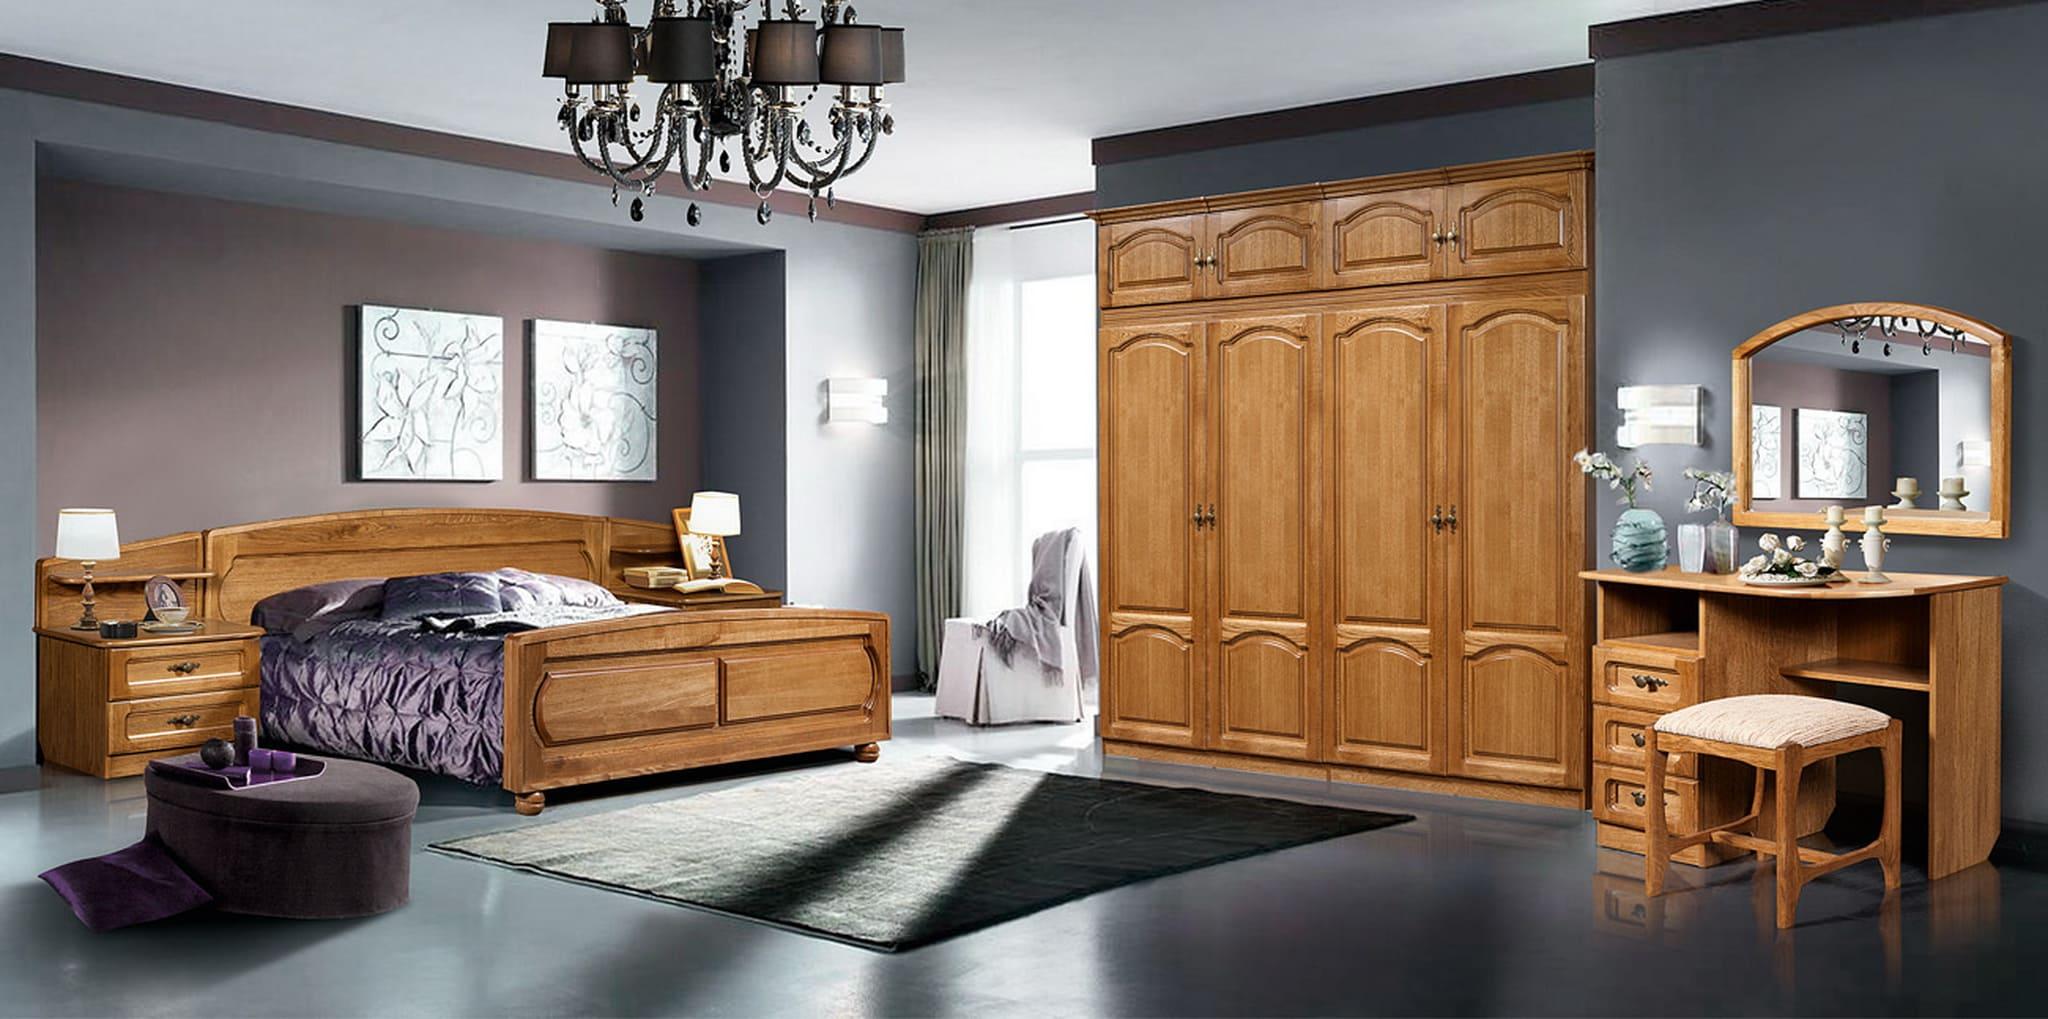 Набор мебели для спальни «Купава-1» ГМ 8420 (дуб)